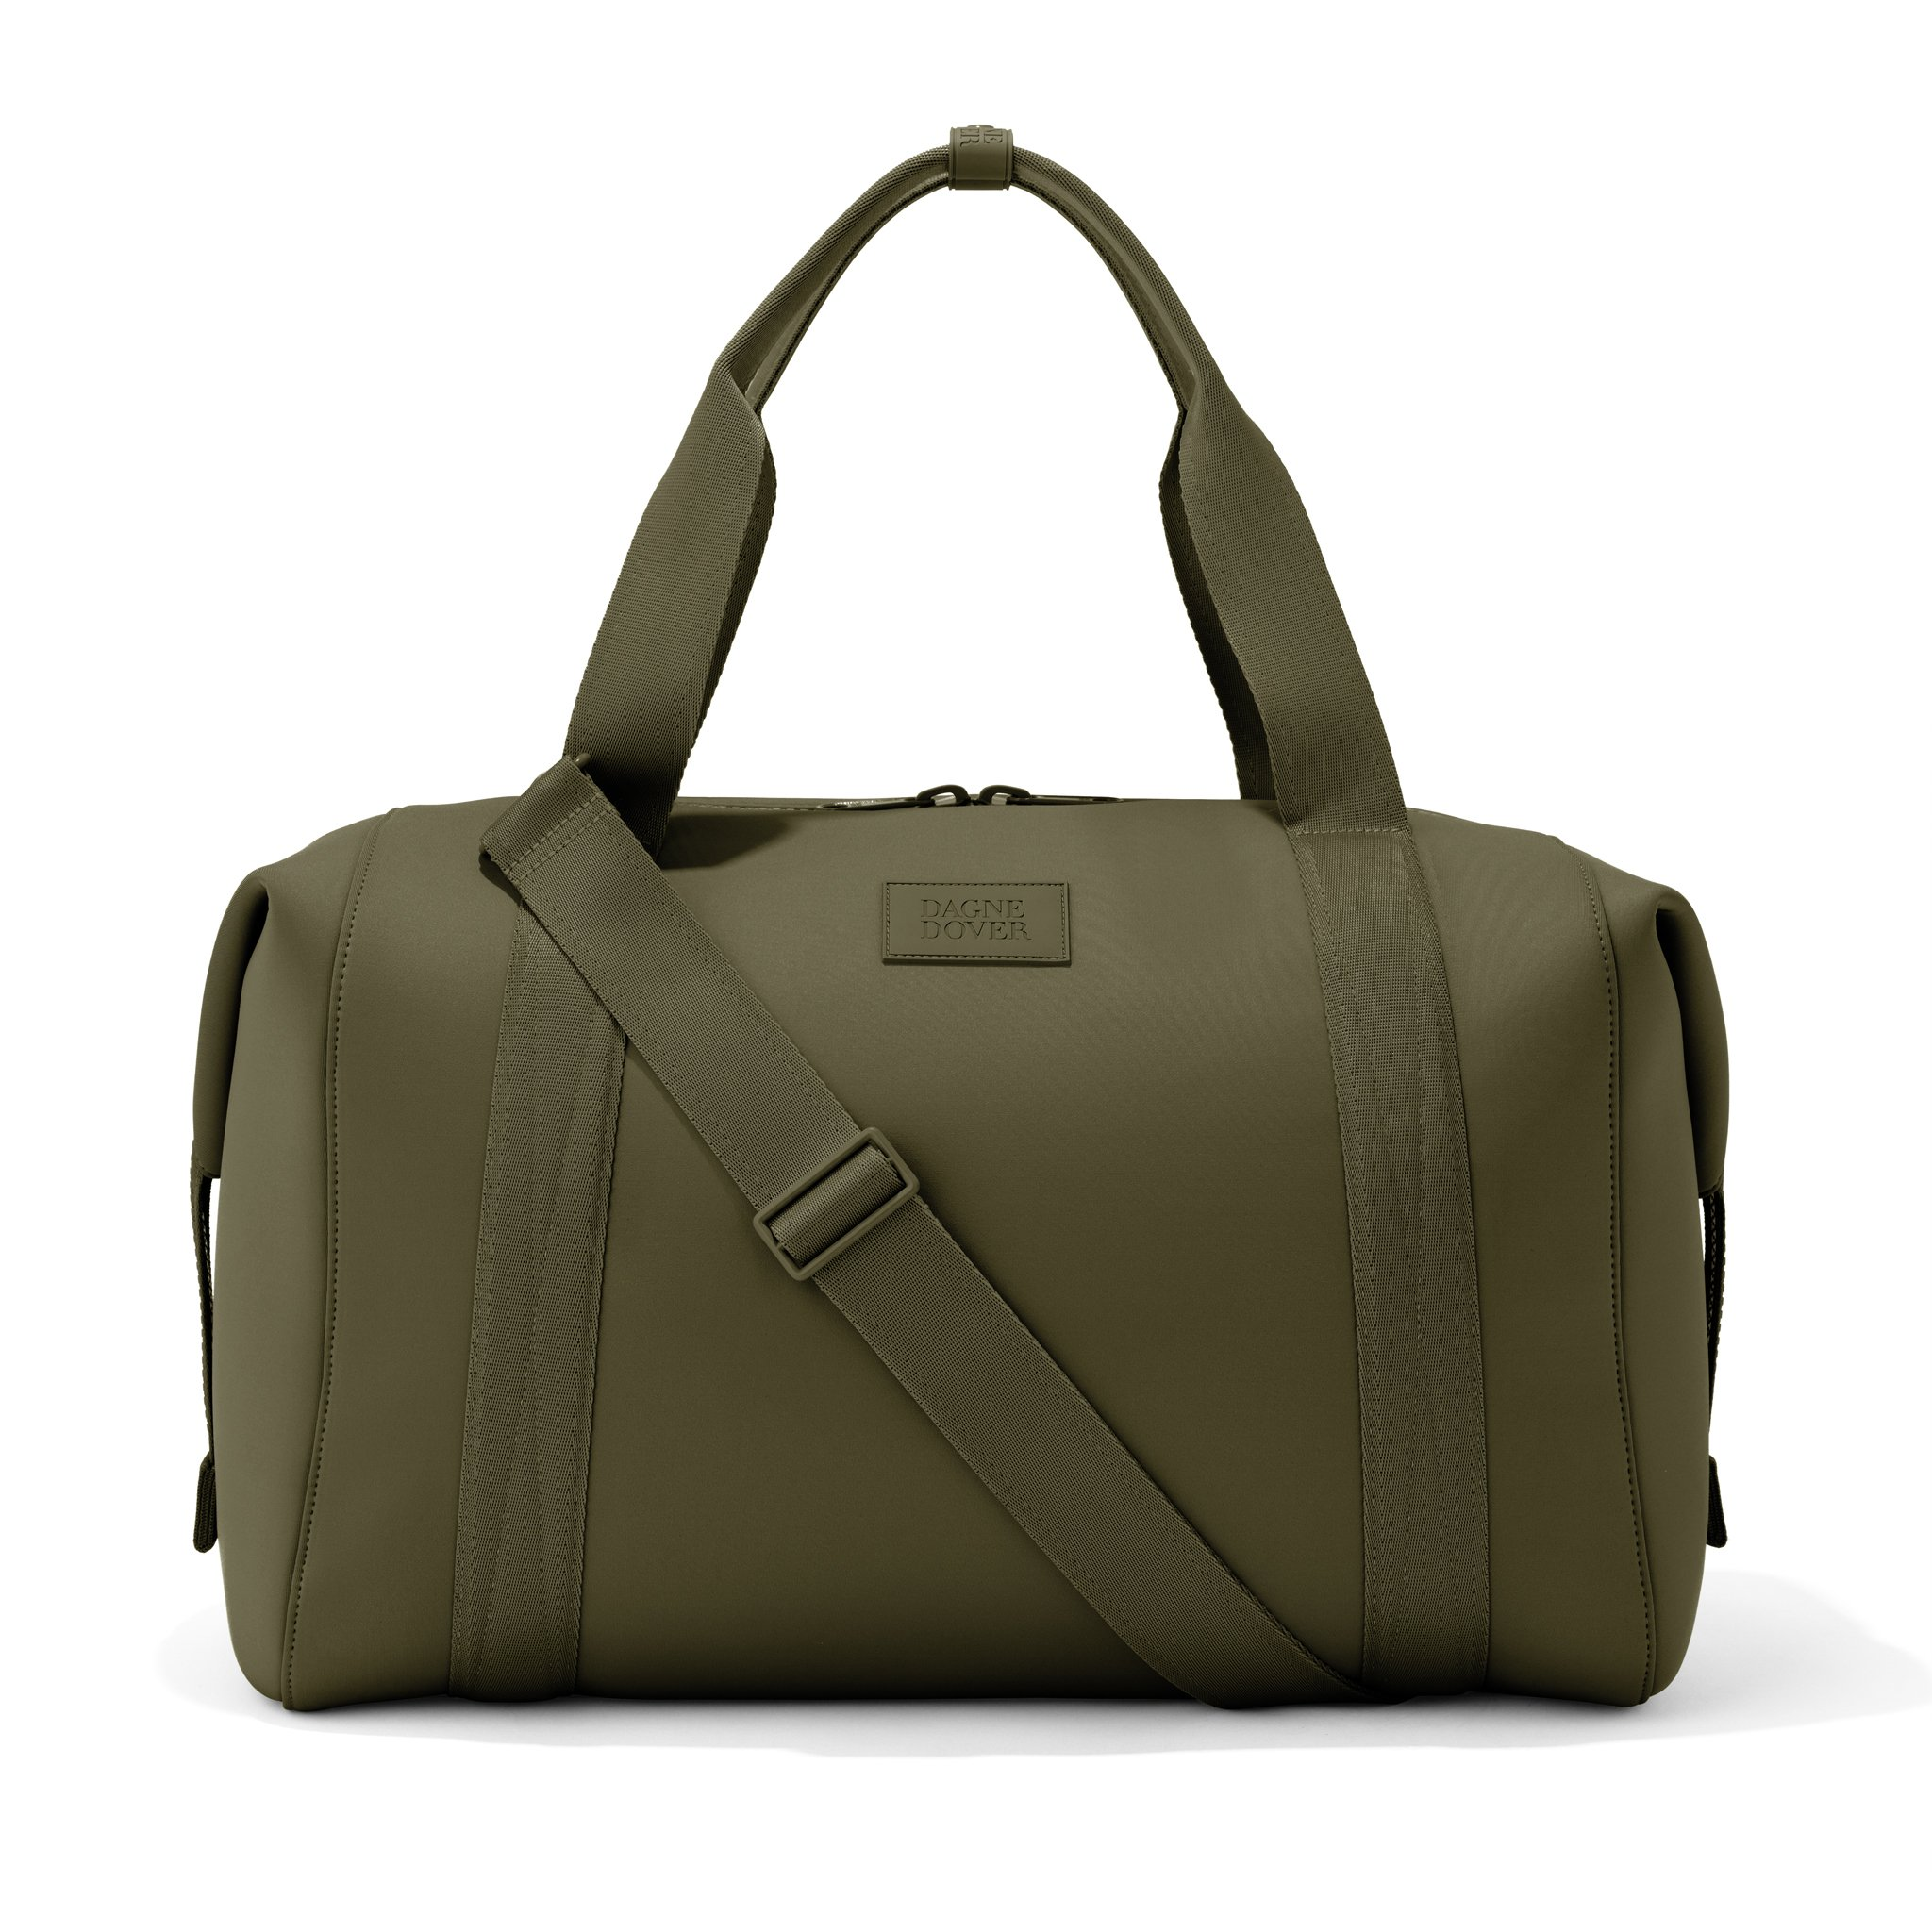 Landon Carryall Bag $215.00